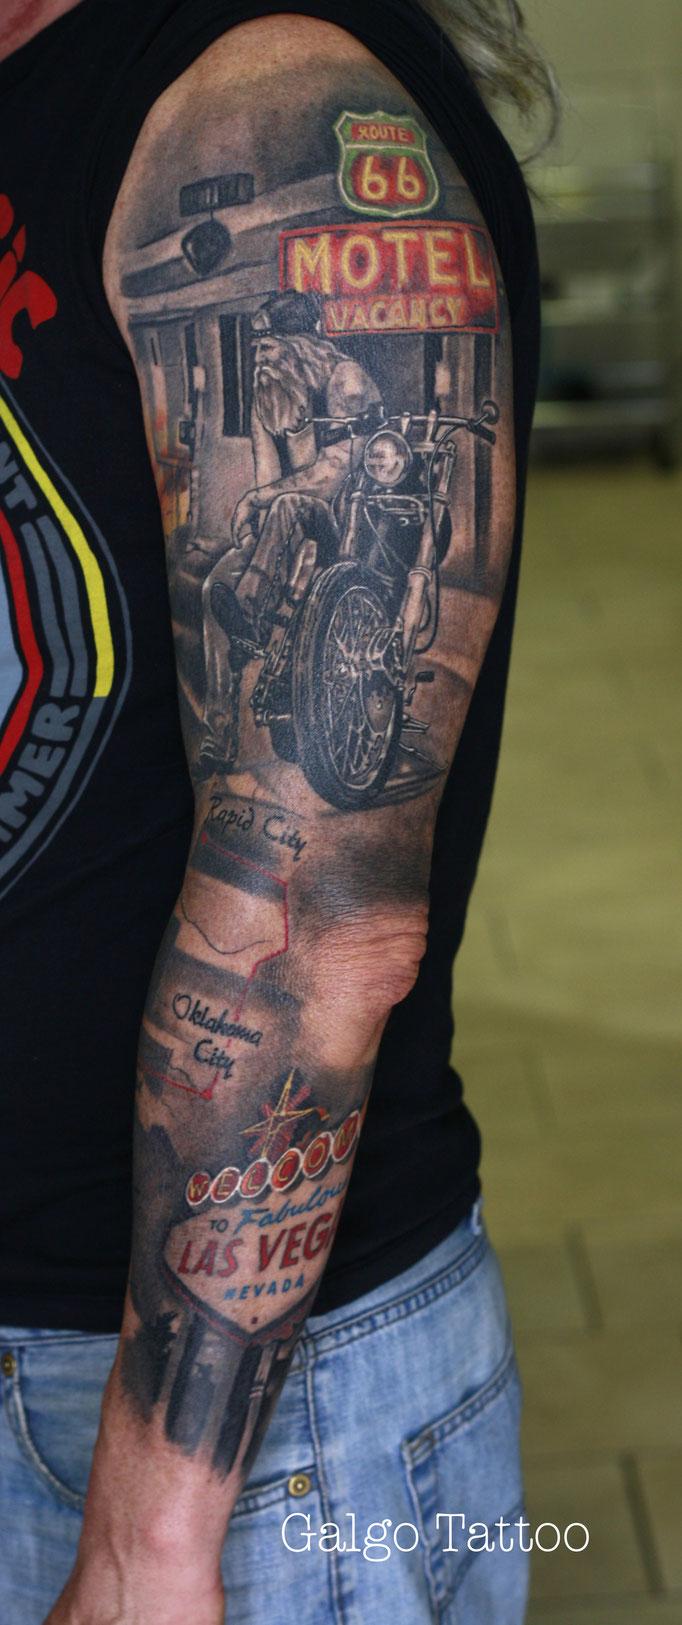 Route 66 full sleeve realistic tattoo.